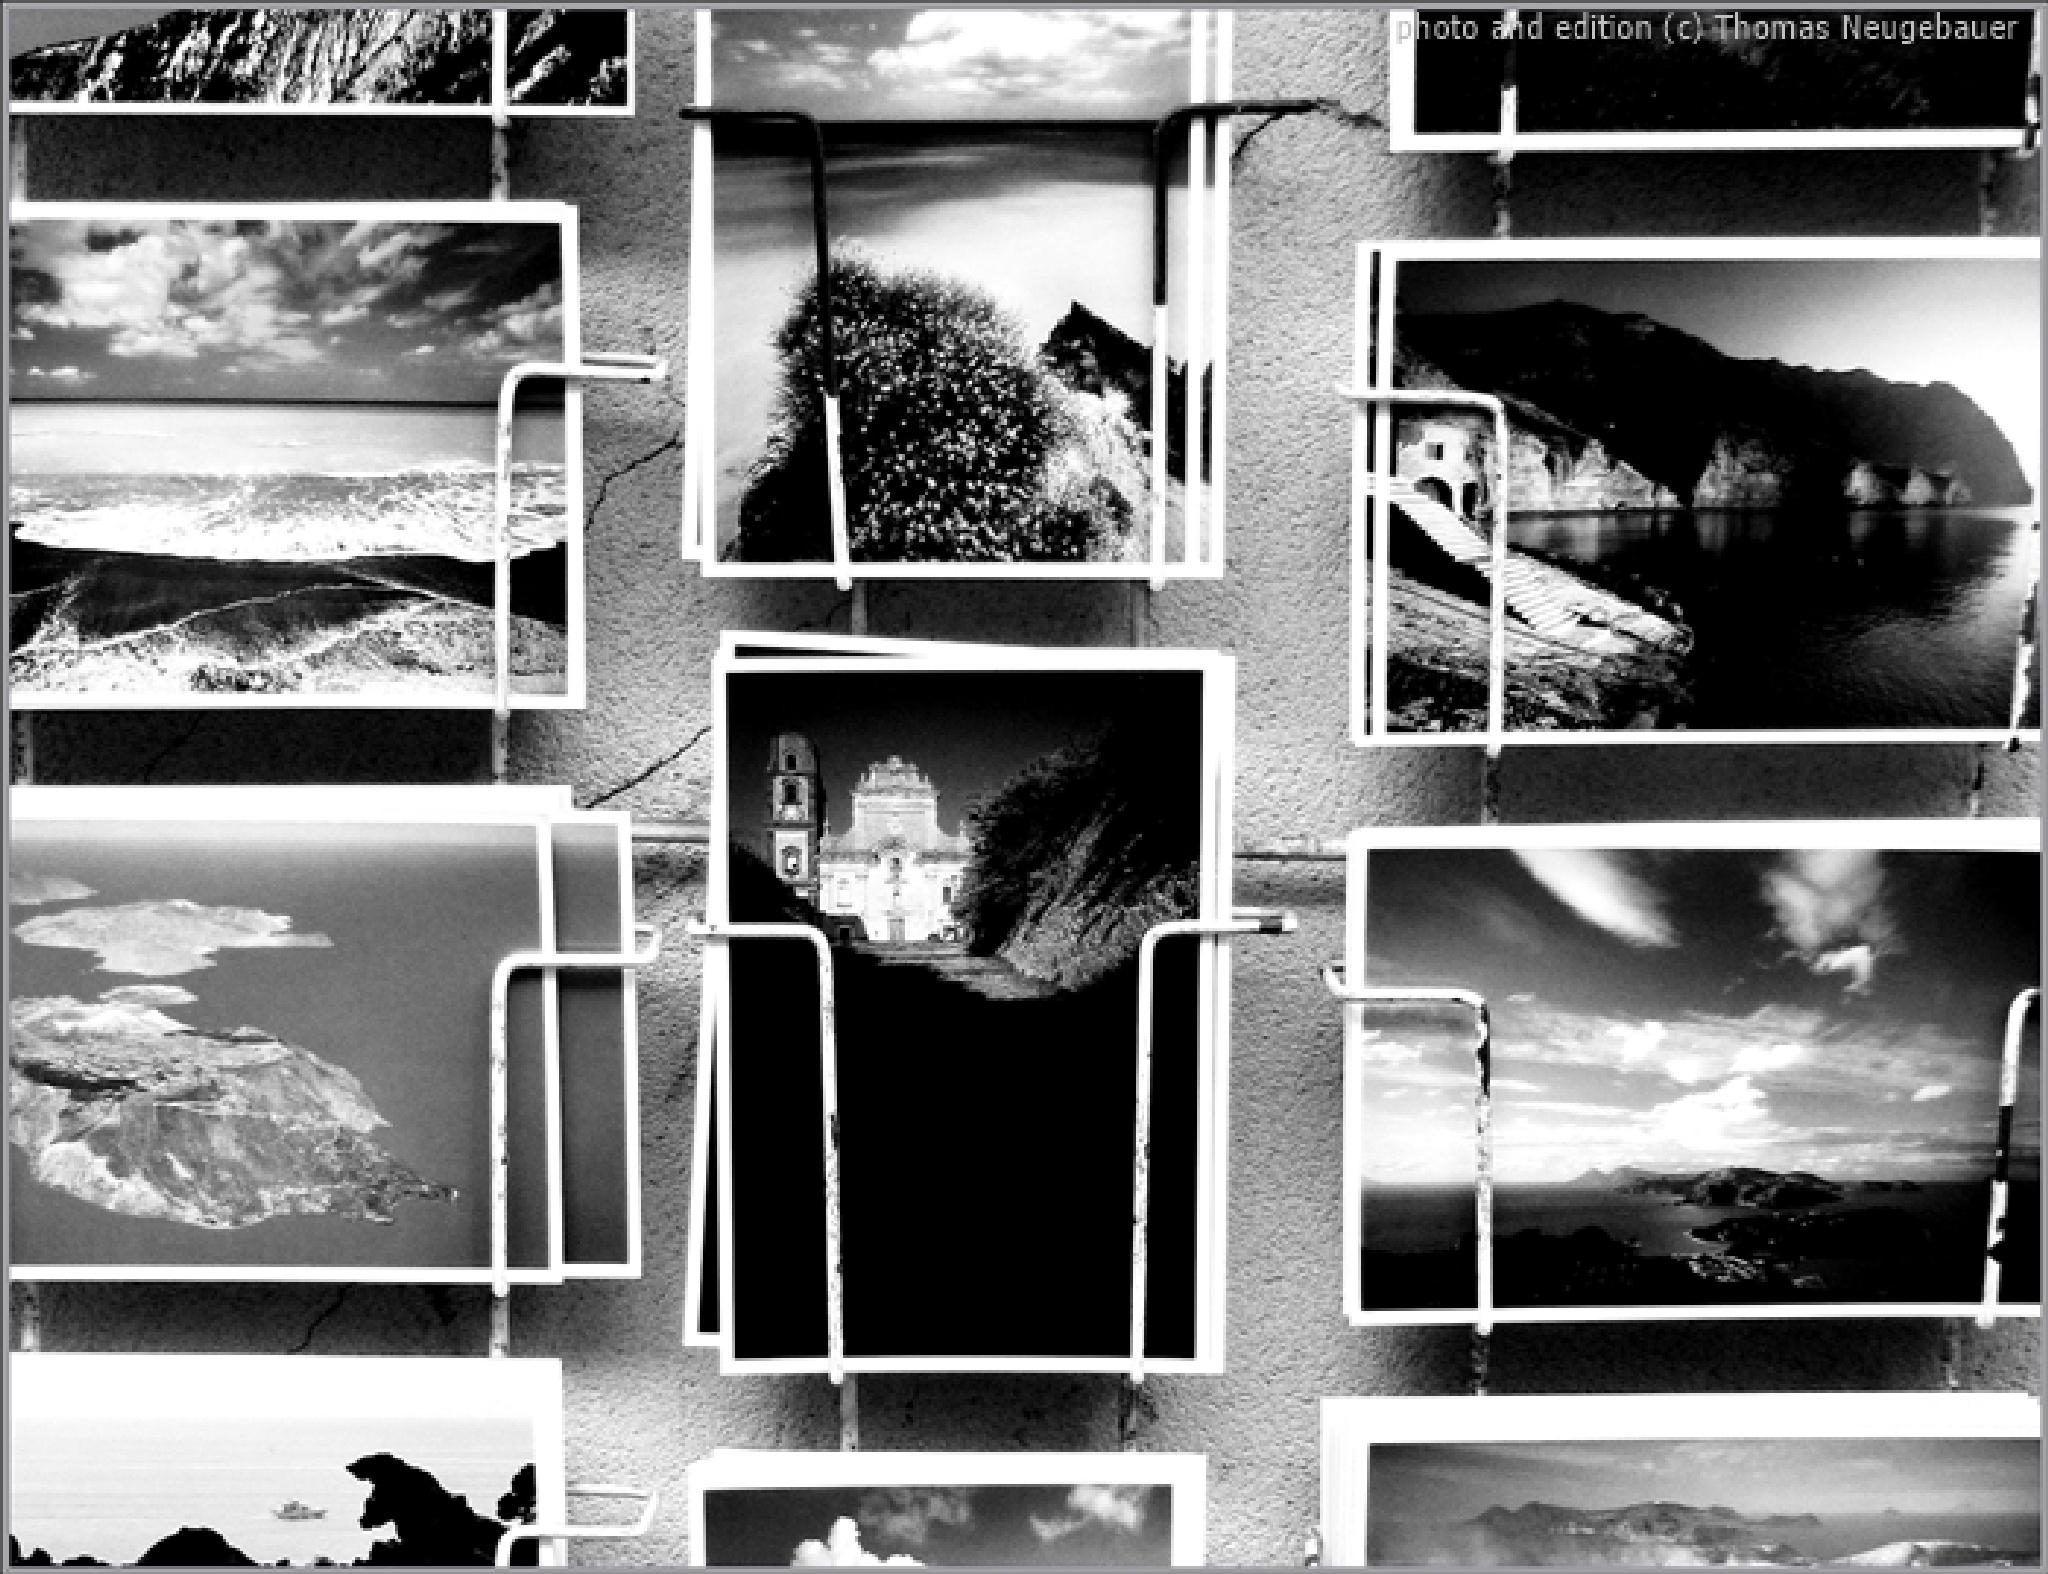 # 608 Greetings from Lipari by Thomas Neugebauer